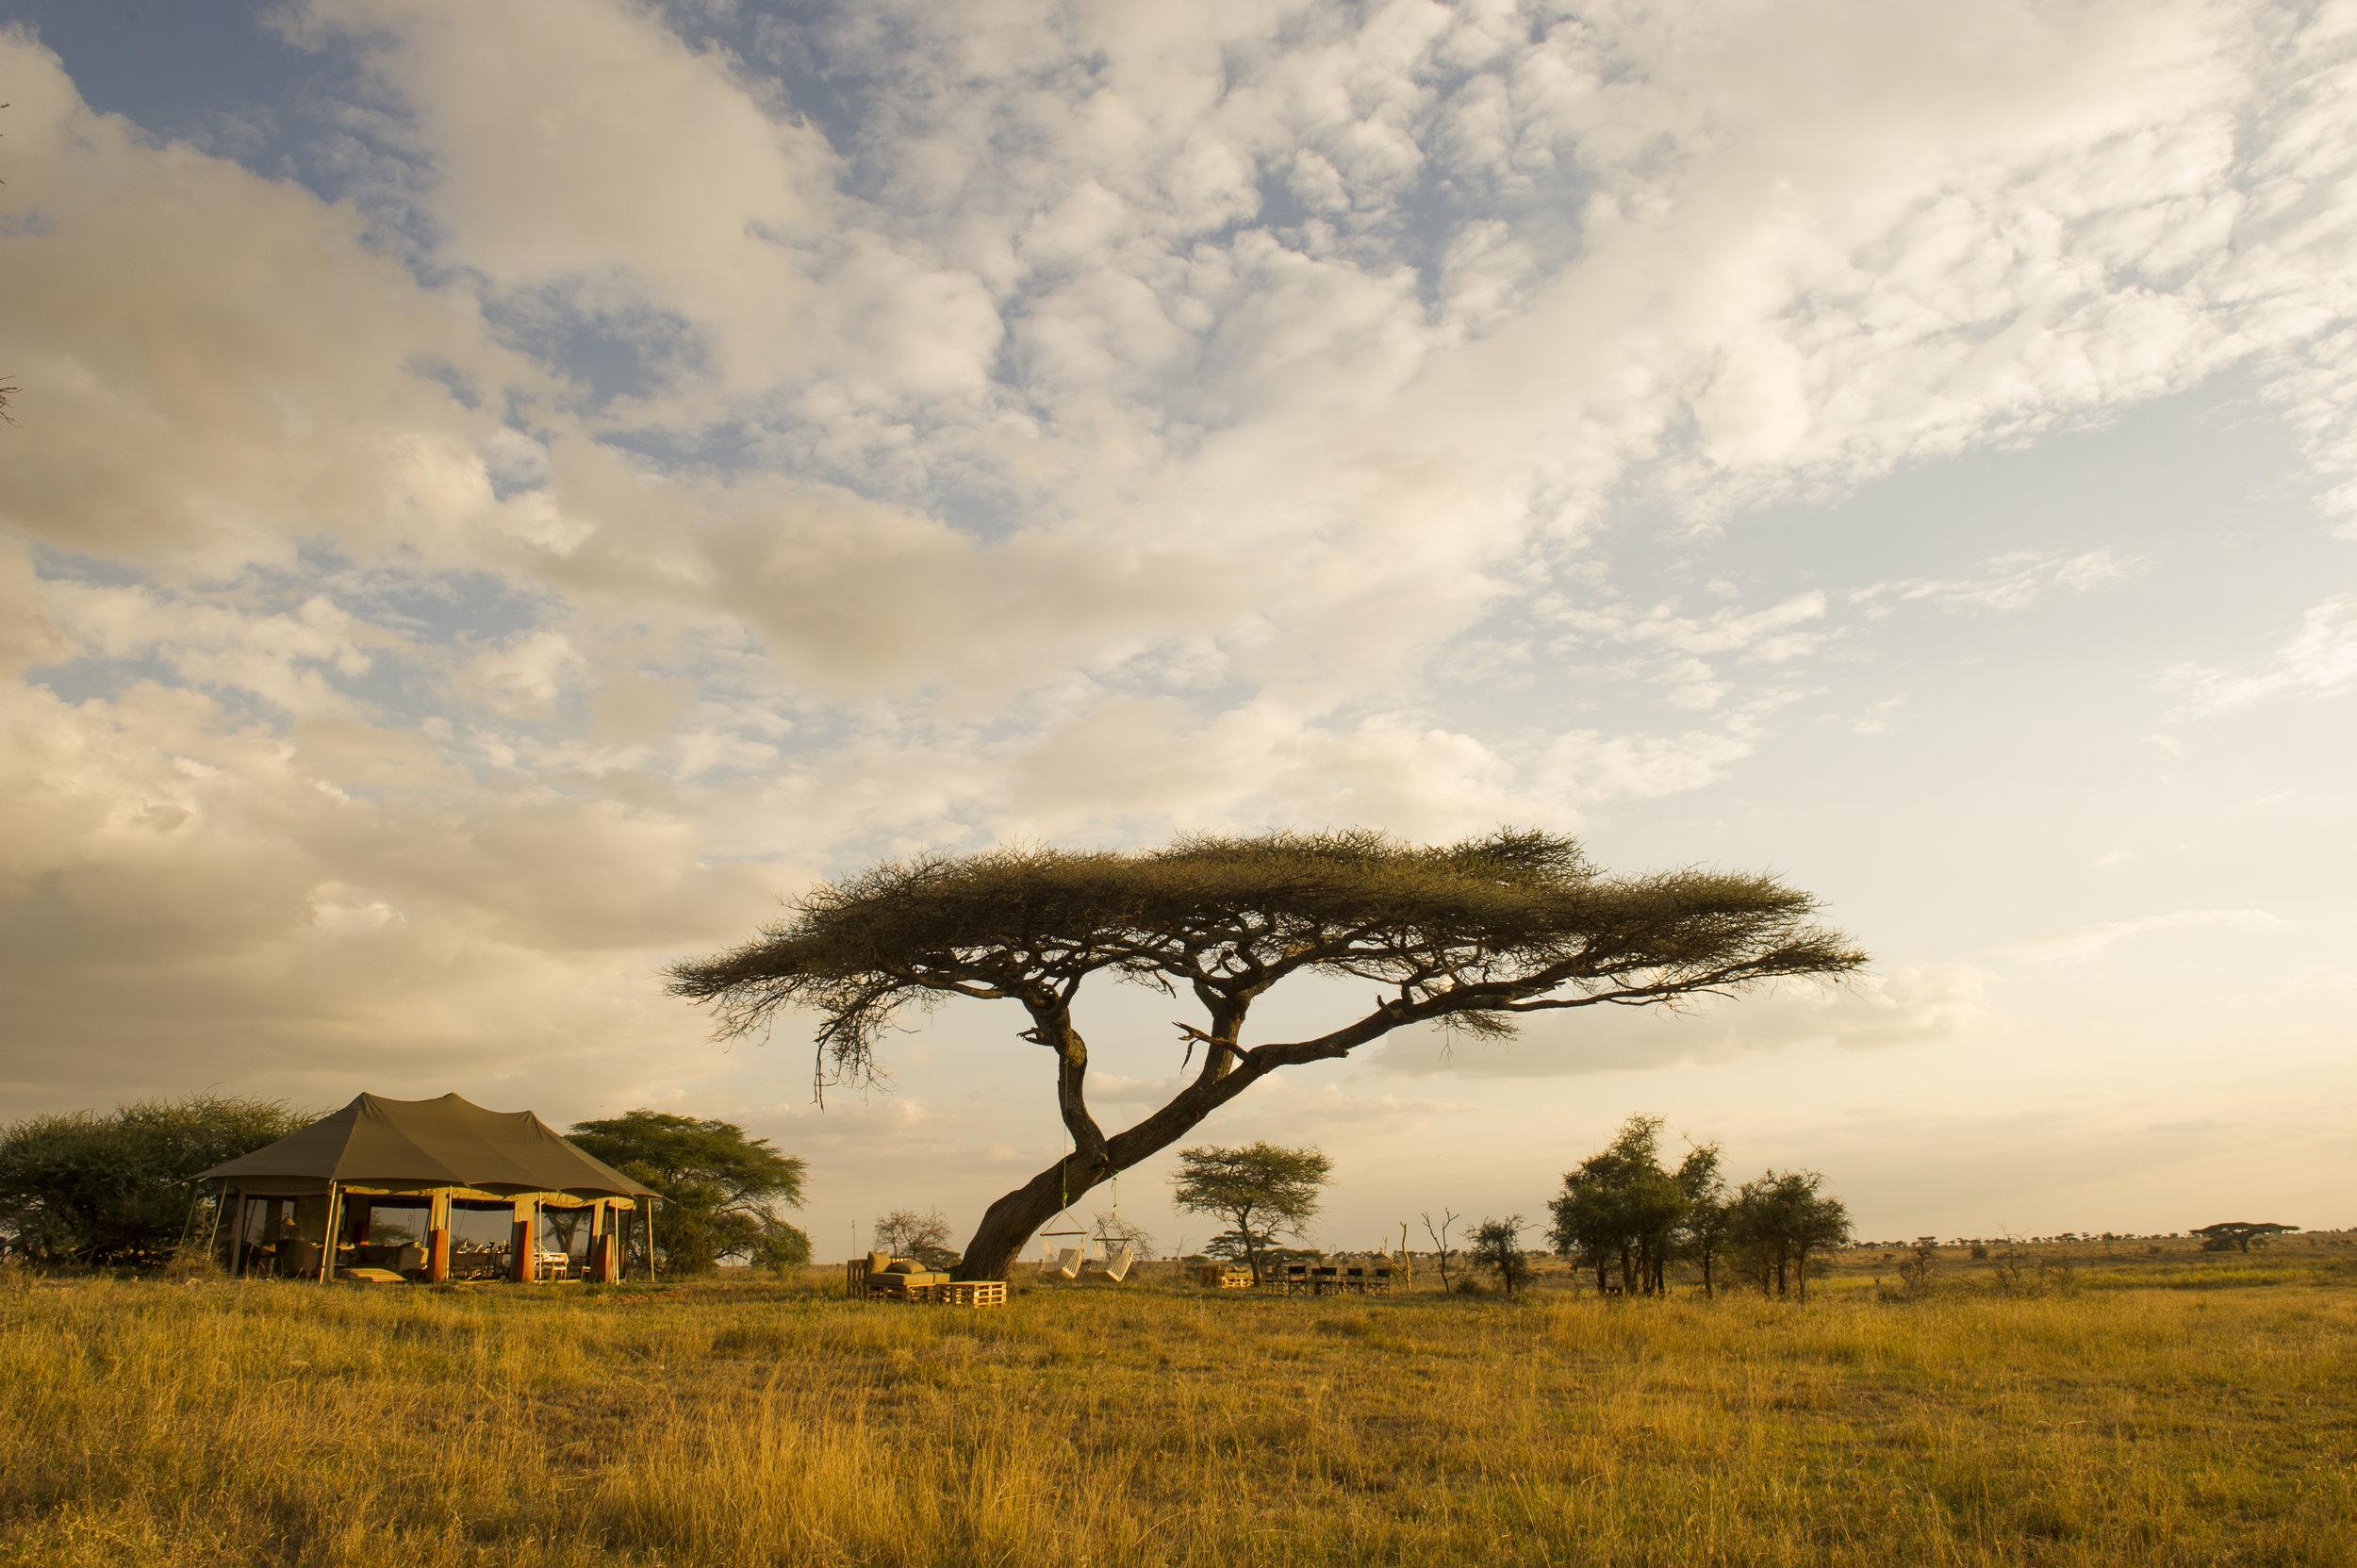 Namiri-Plains-Mess-Tent-Outside-Area-Paul-Joynson-Hicks-MR.jpg